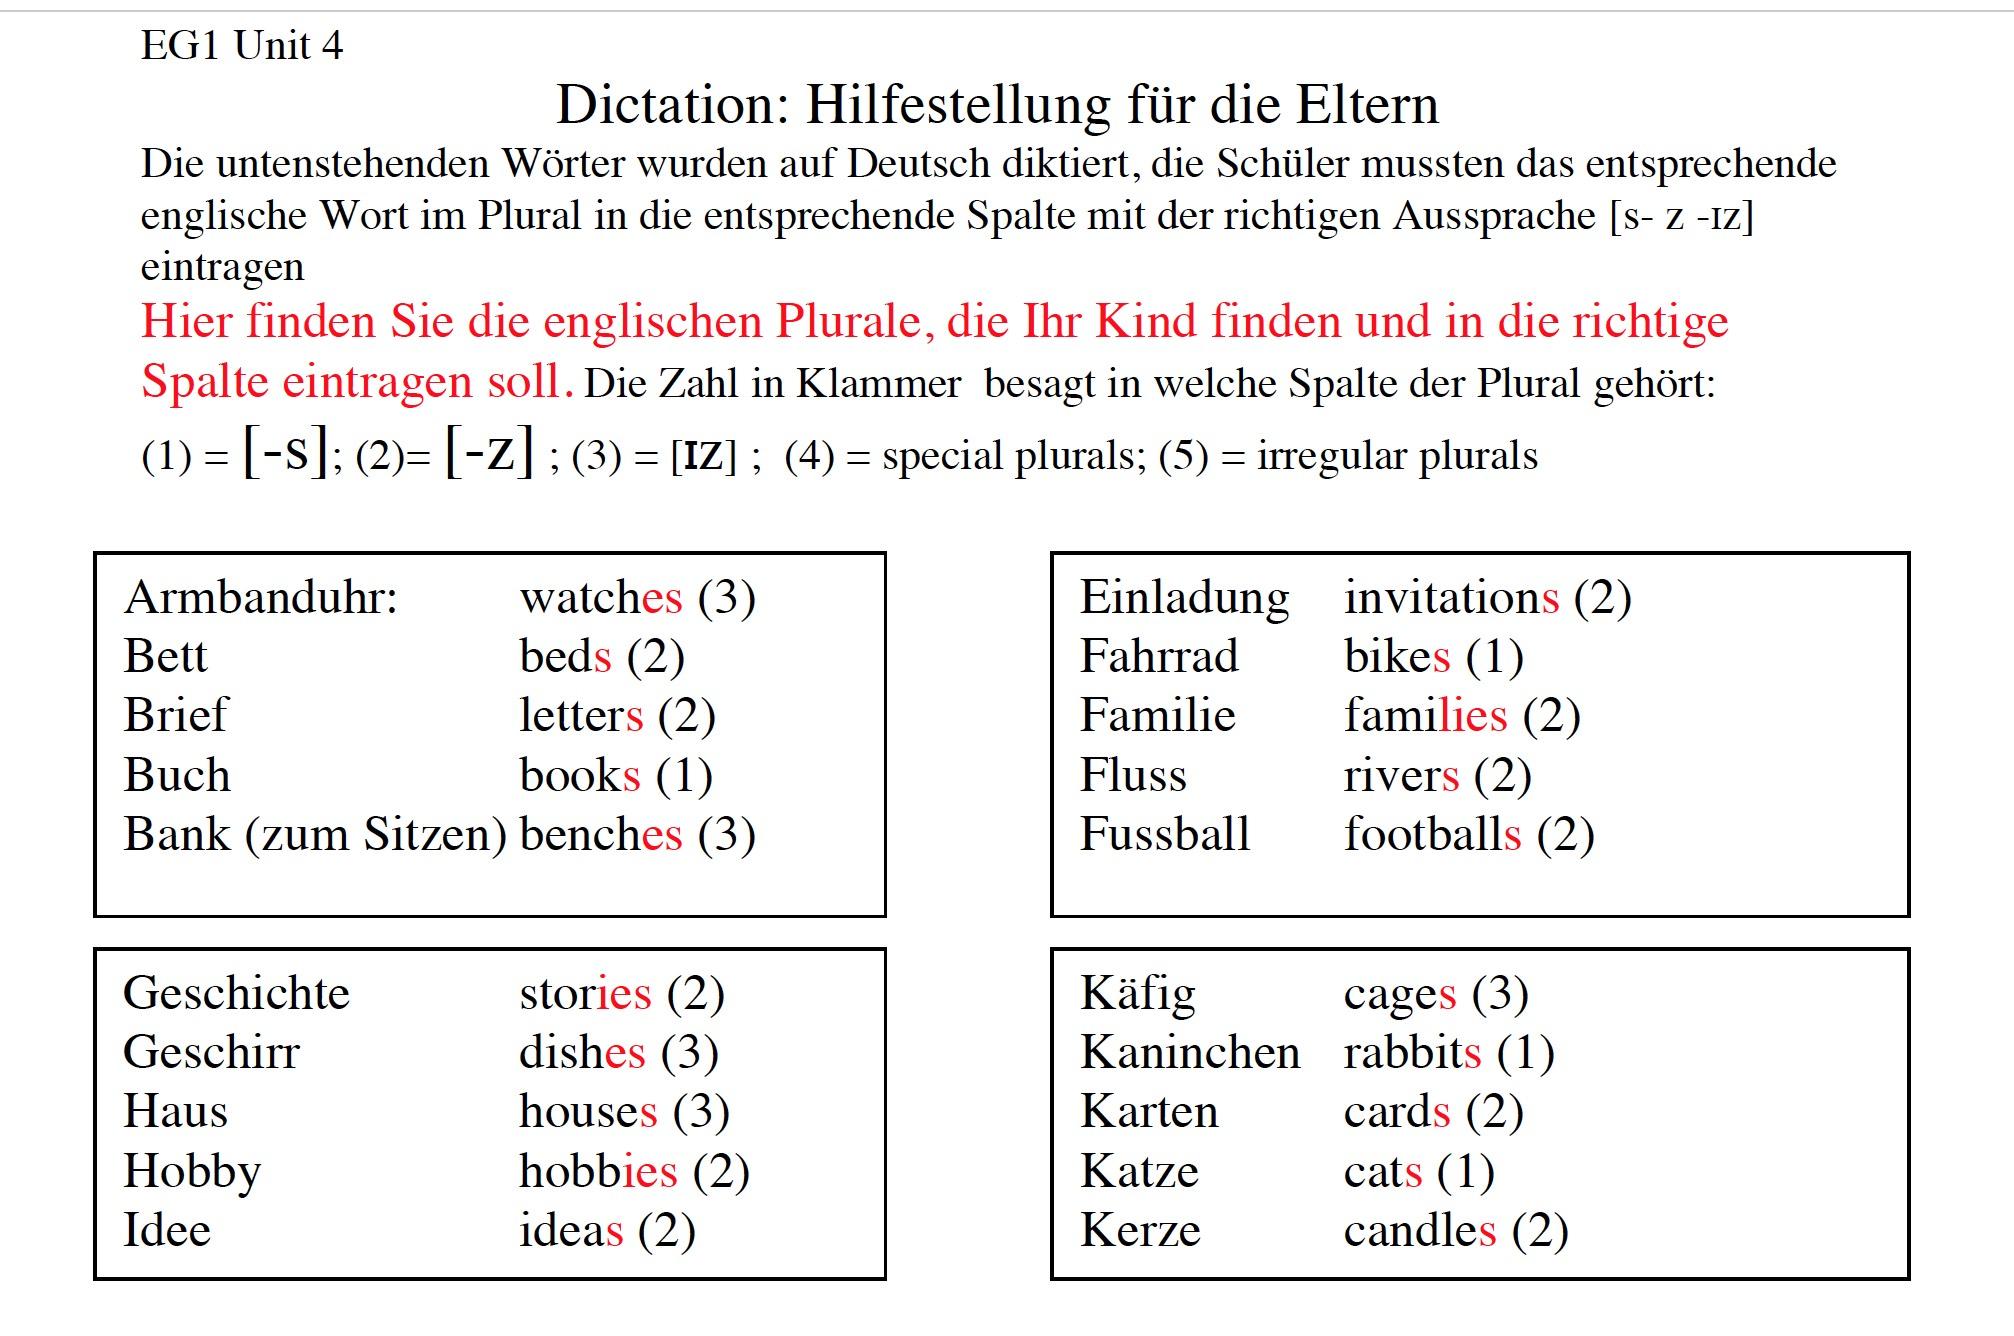 EG1_U4_Dictation_Exc1_Loes1a